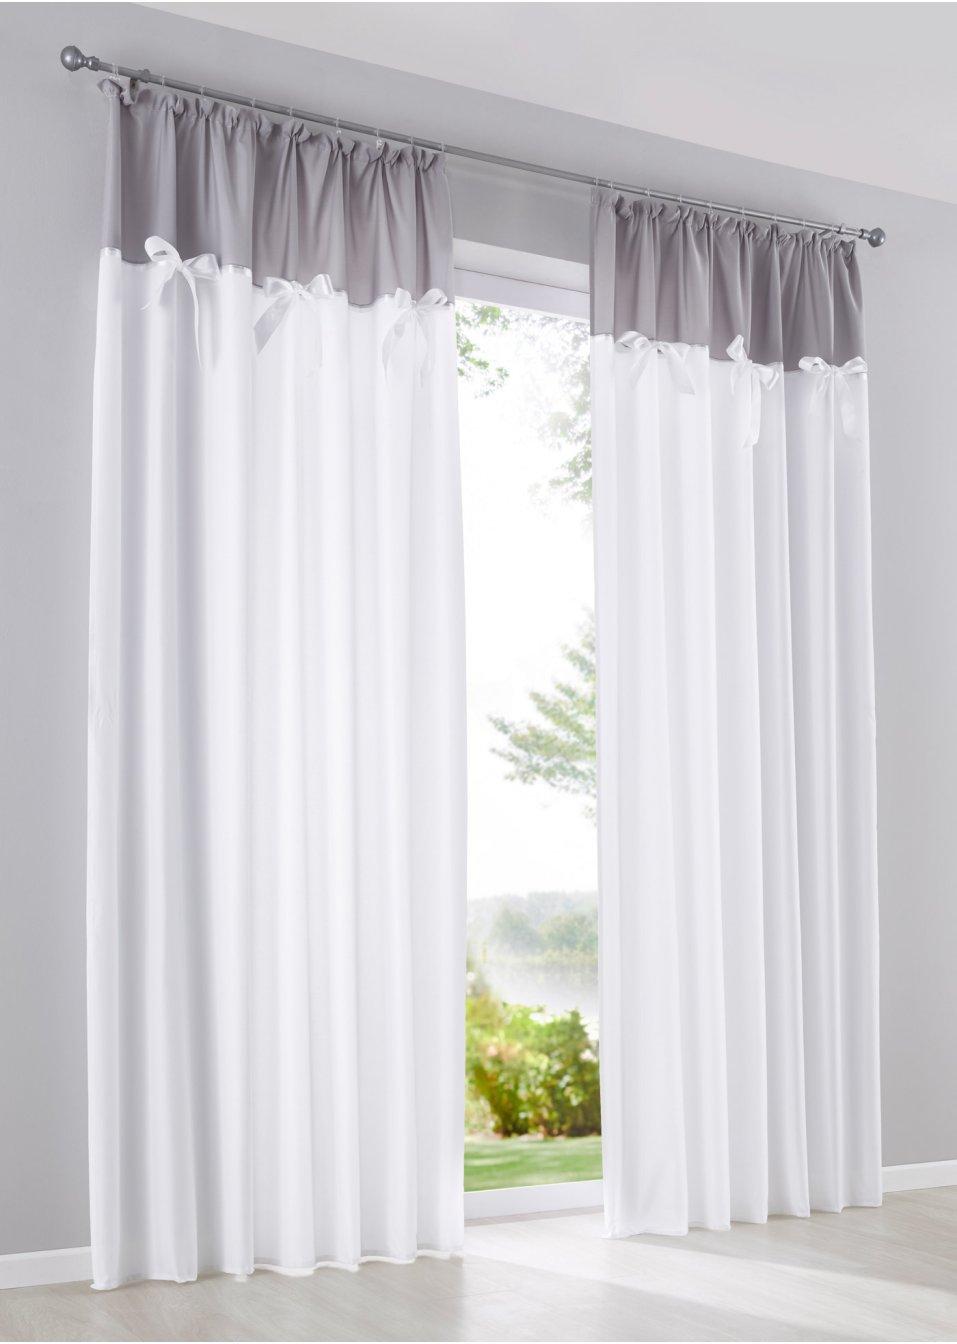 Vorhang lena 1er pack weiss grau wohnen - Bonprix vorhang ...